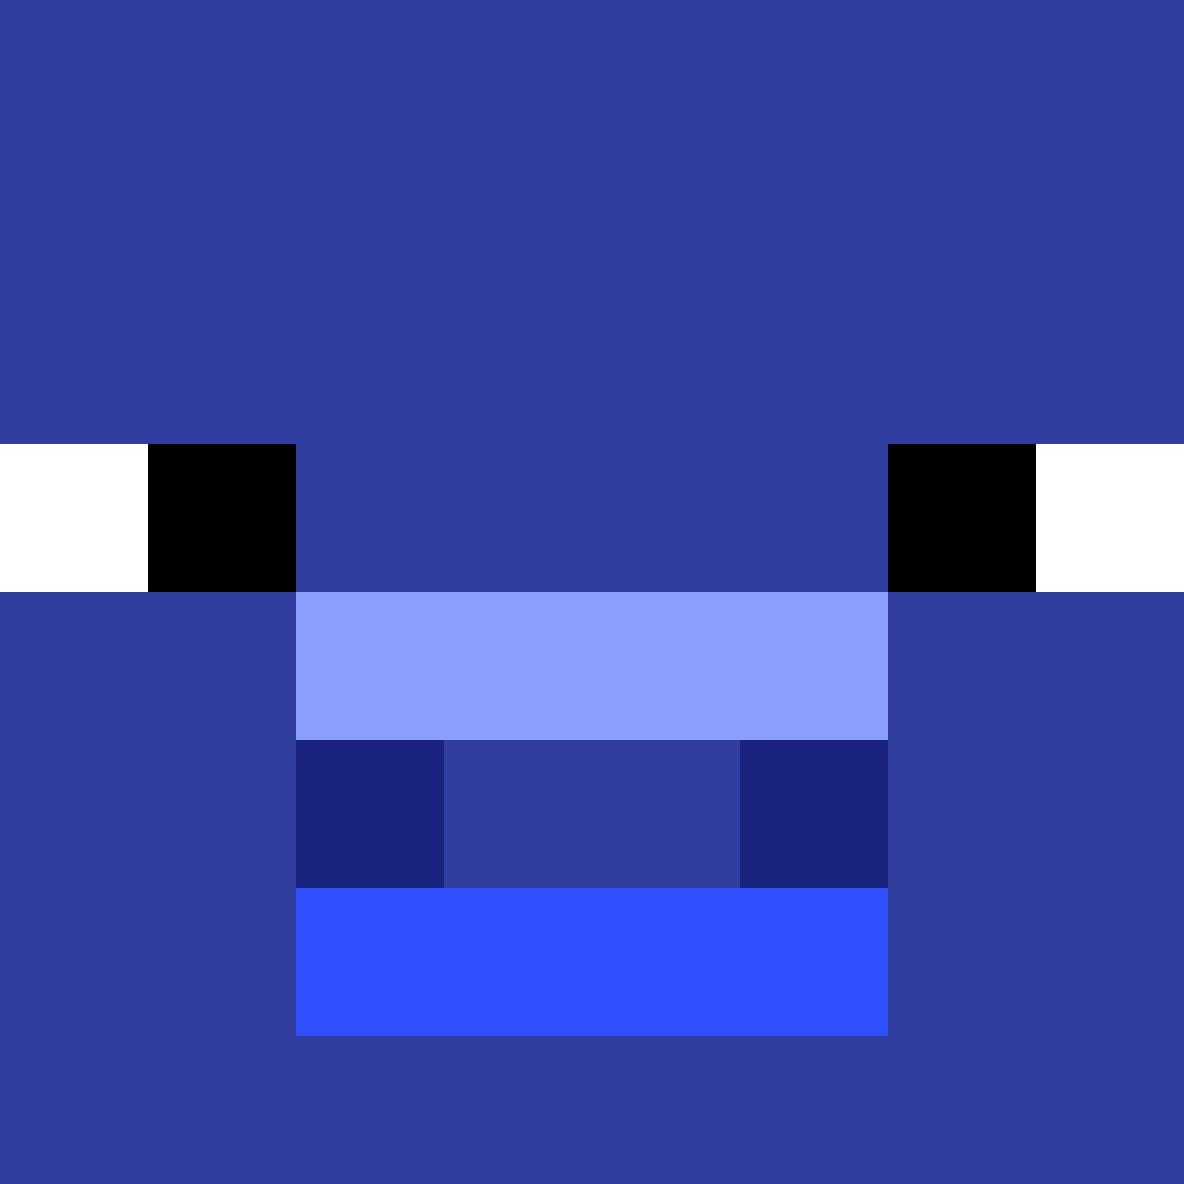 blue pig by EddieChero